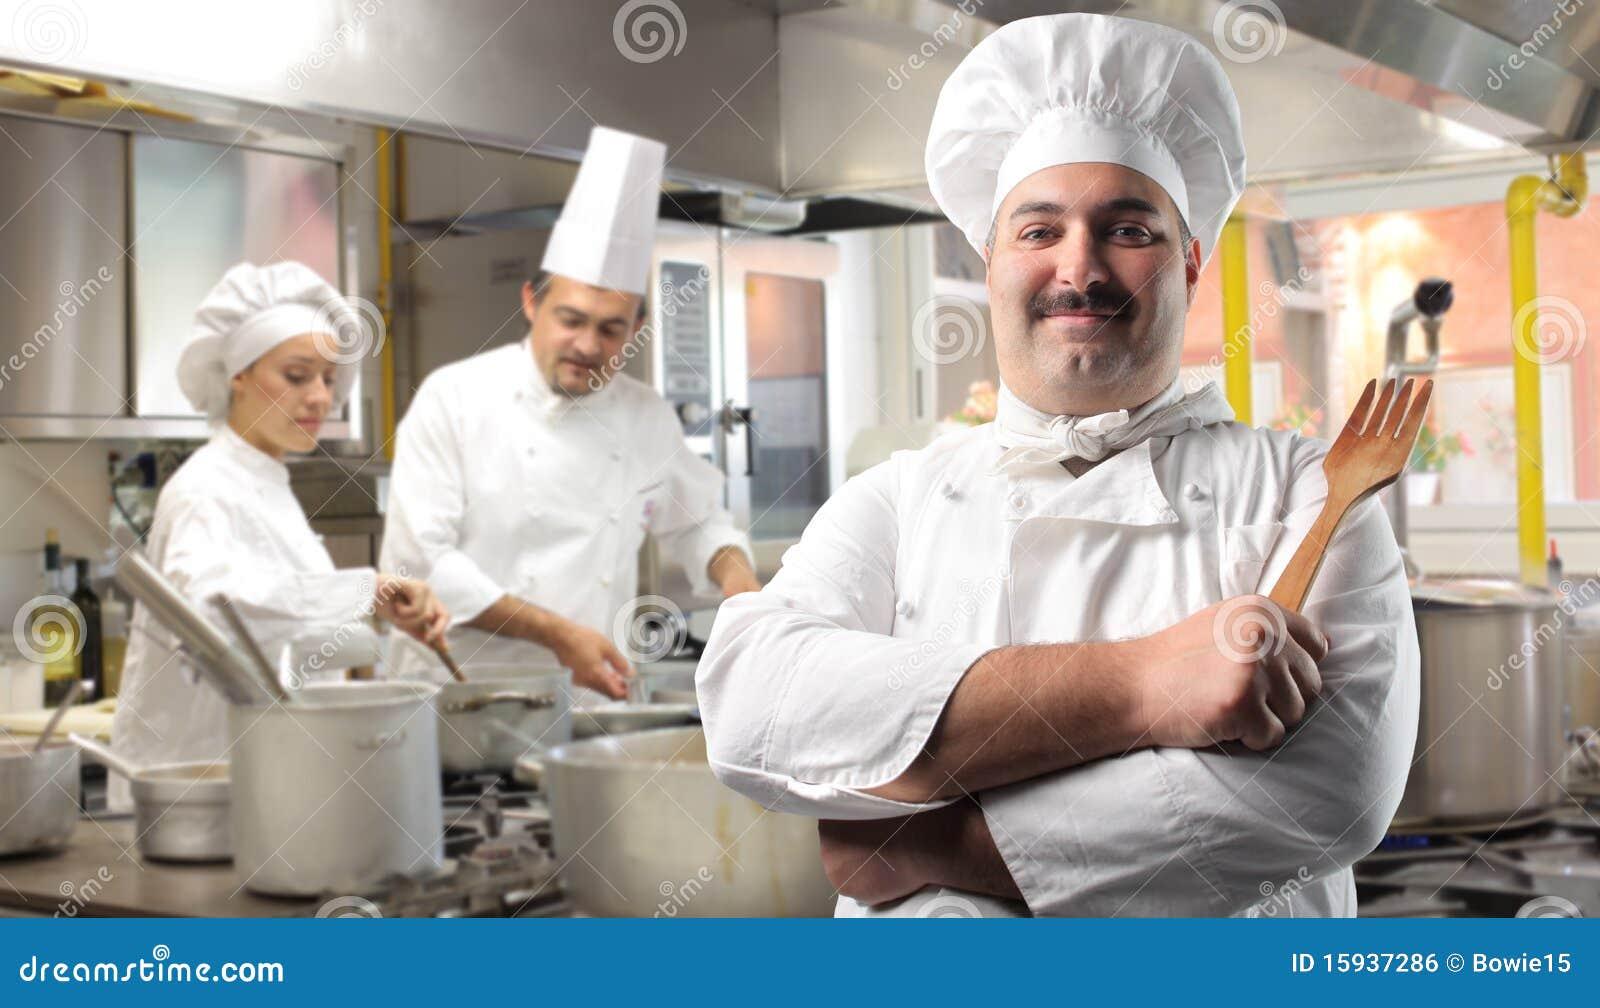 Restaurant Kitchen Pictures restaurant kitchen royalty free stock photos - image: 27268708